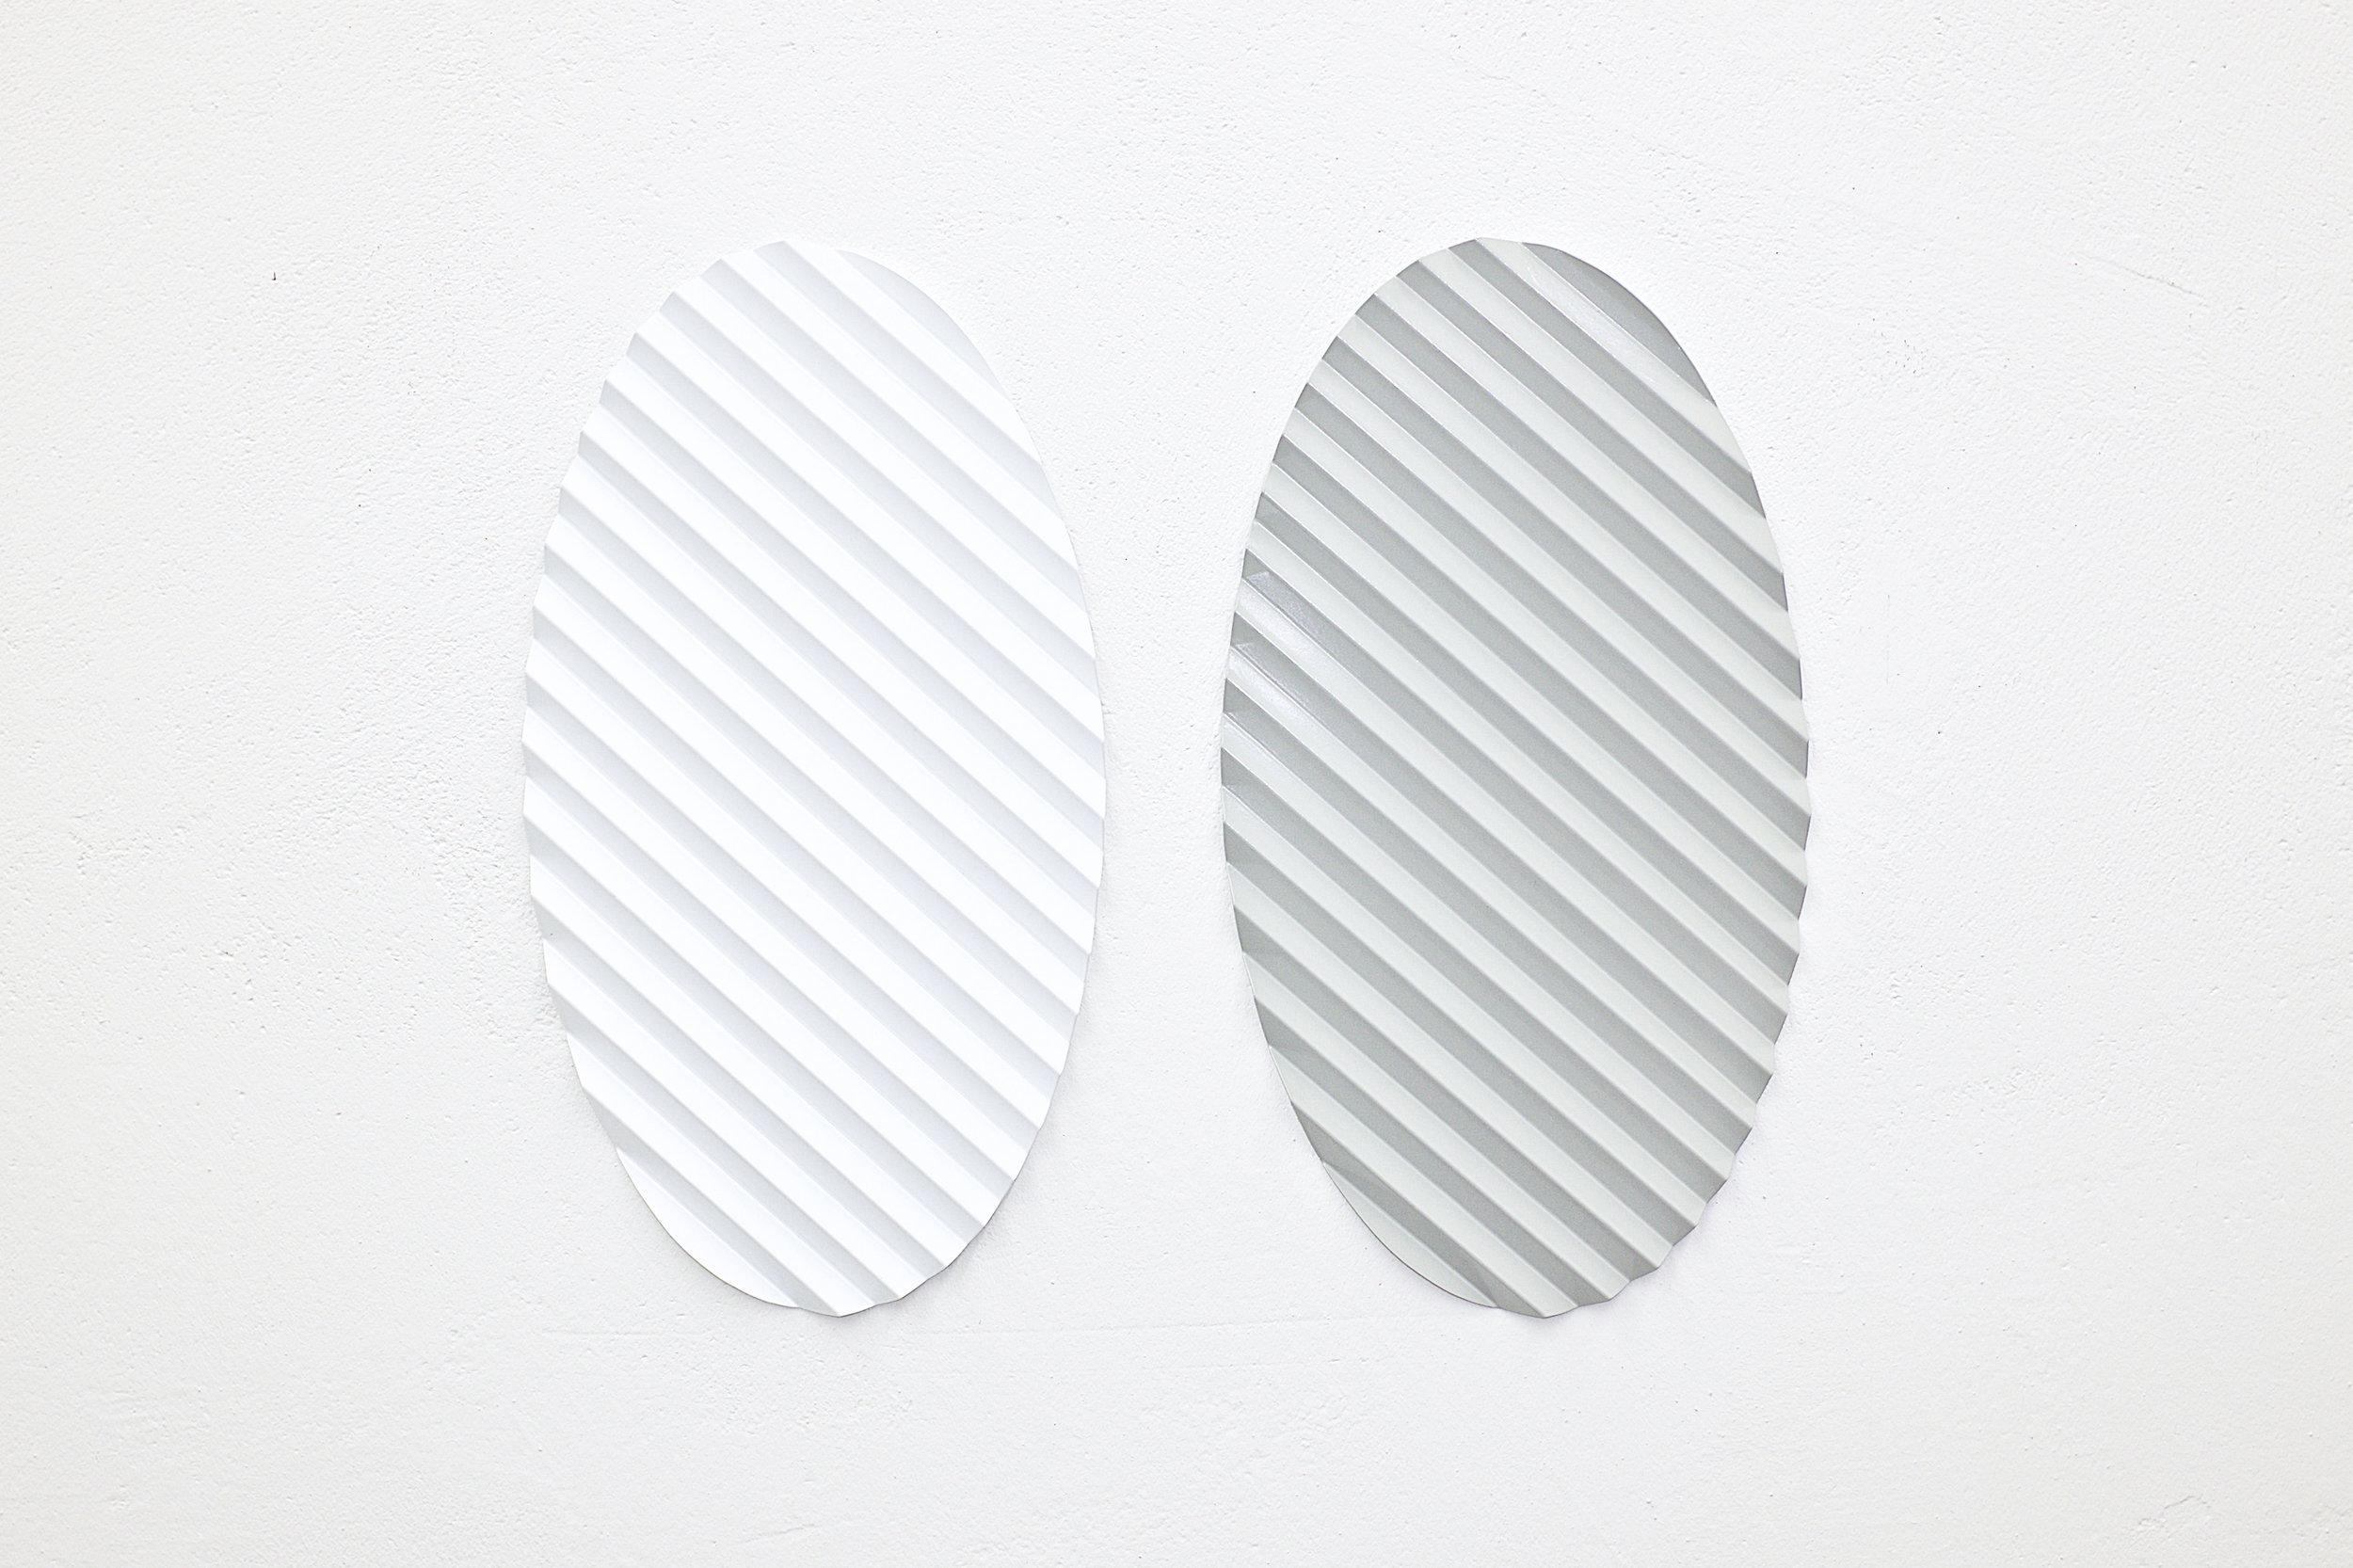 multiple nr. 01.1-10/2019 (ovales relief) - kunstharz auf alu - 42 x 22.8 x 1.3 cm